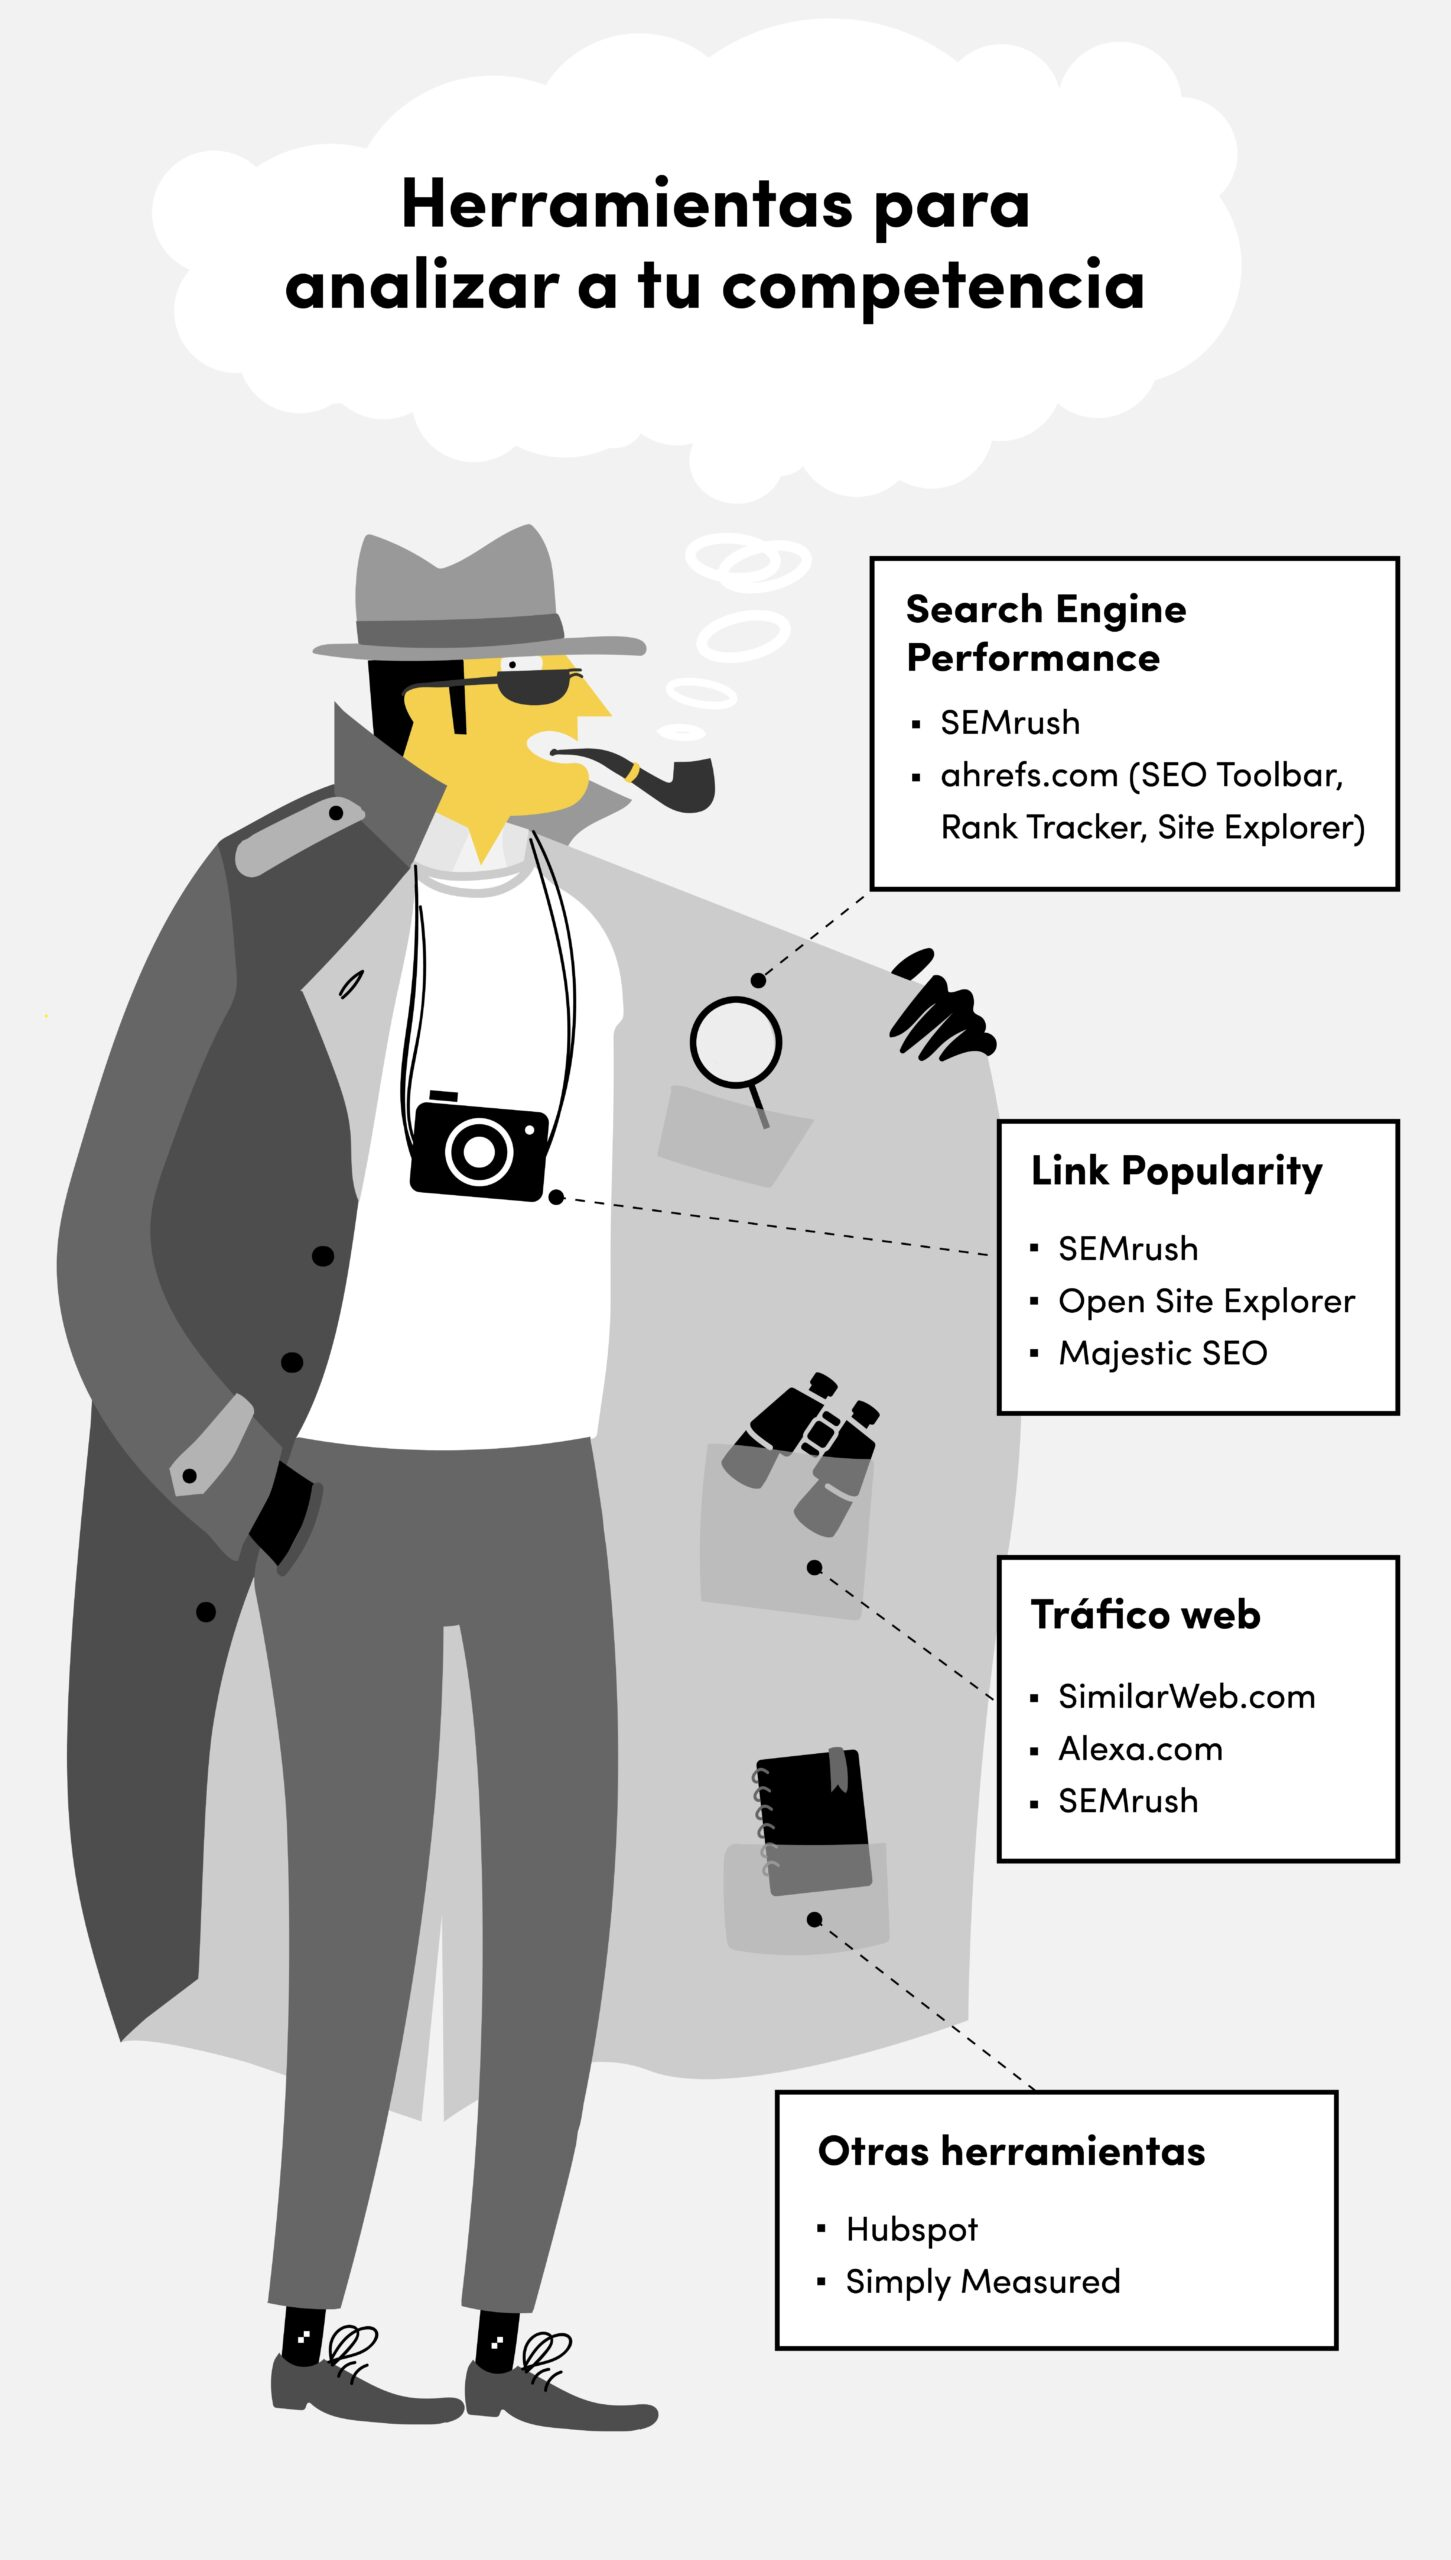 infografia-analizarcompetencia (1).jpg